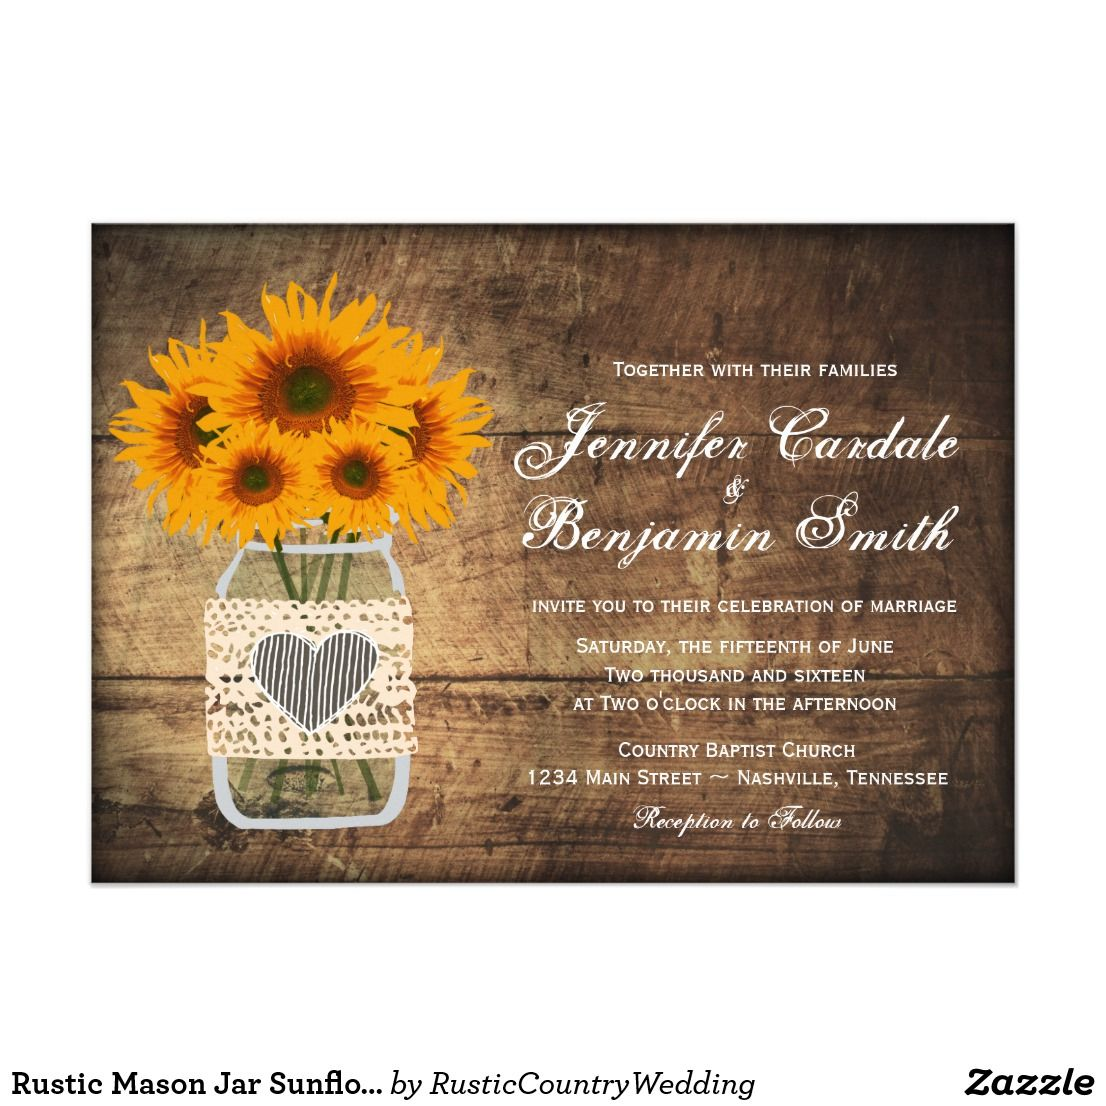 Rustic Mason Jar Sunflower Wedding Invitations   Country Wedding ...